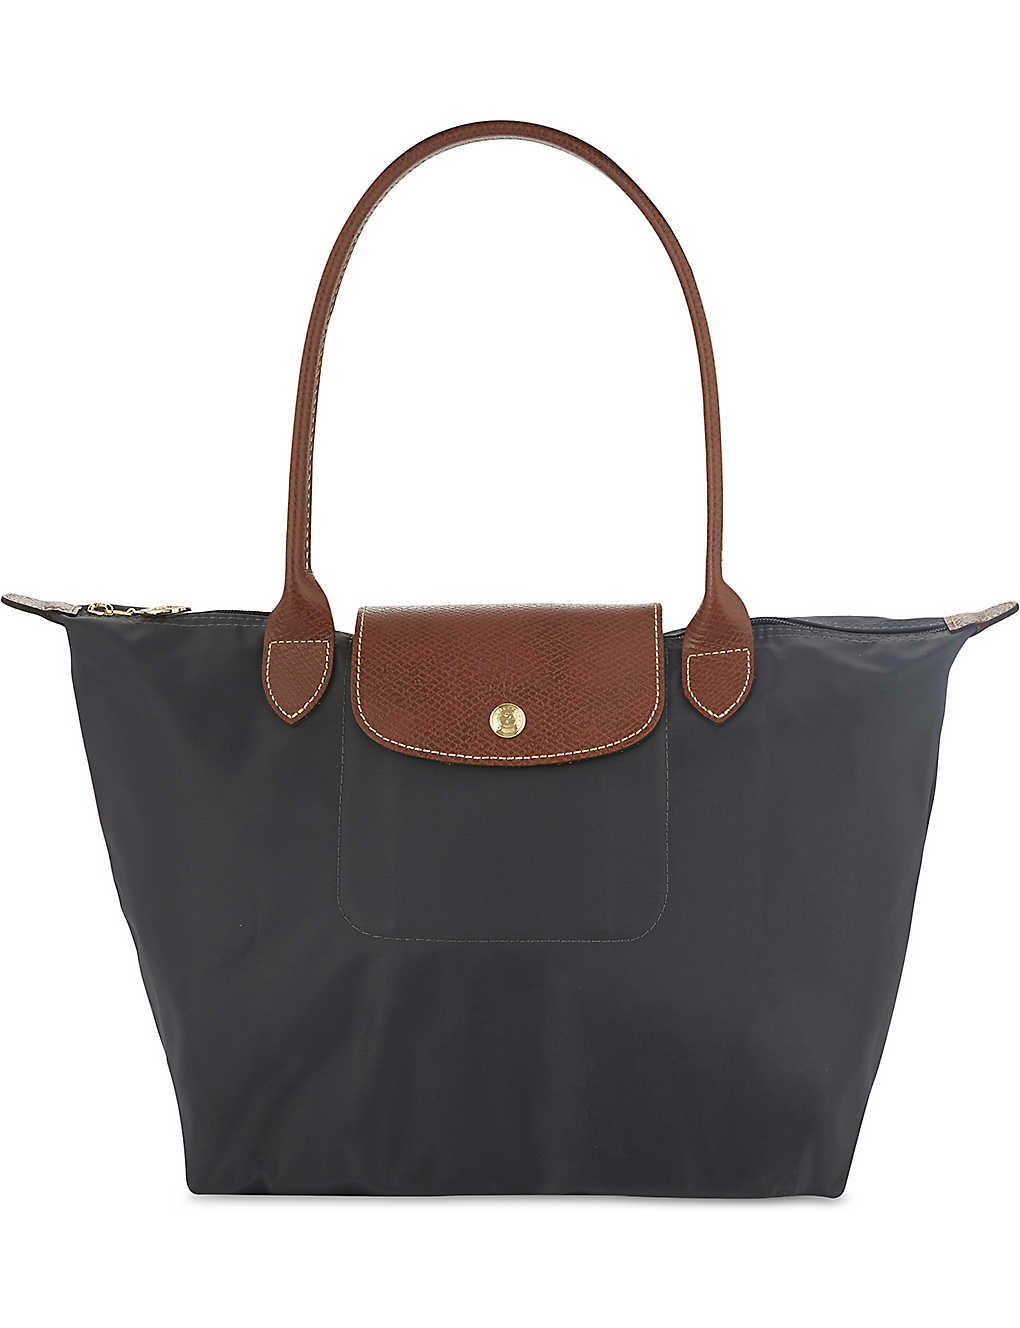 ce68efe7f7 LONGCHAMP - Le Pliage small tote bag | Selfridges.com